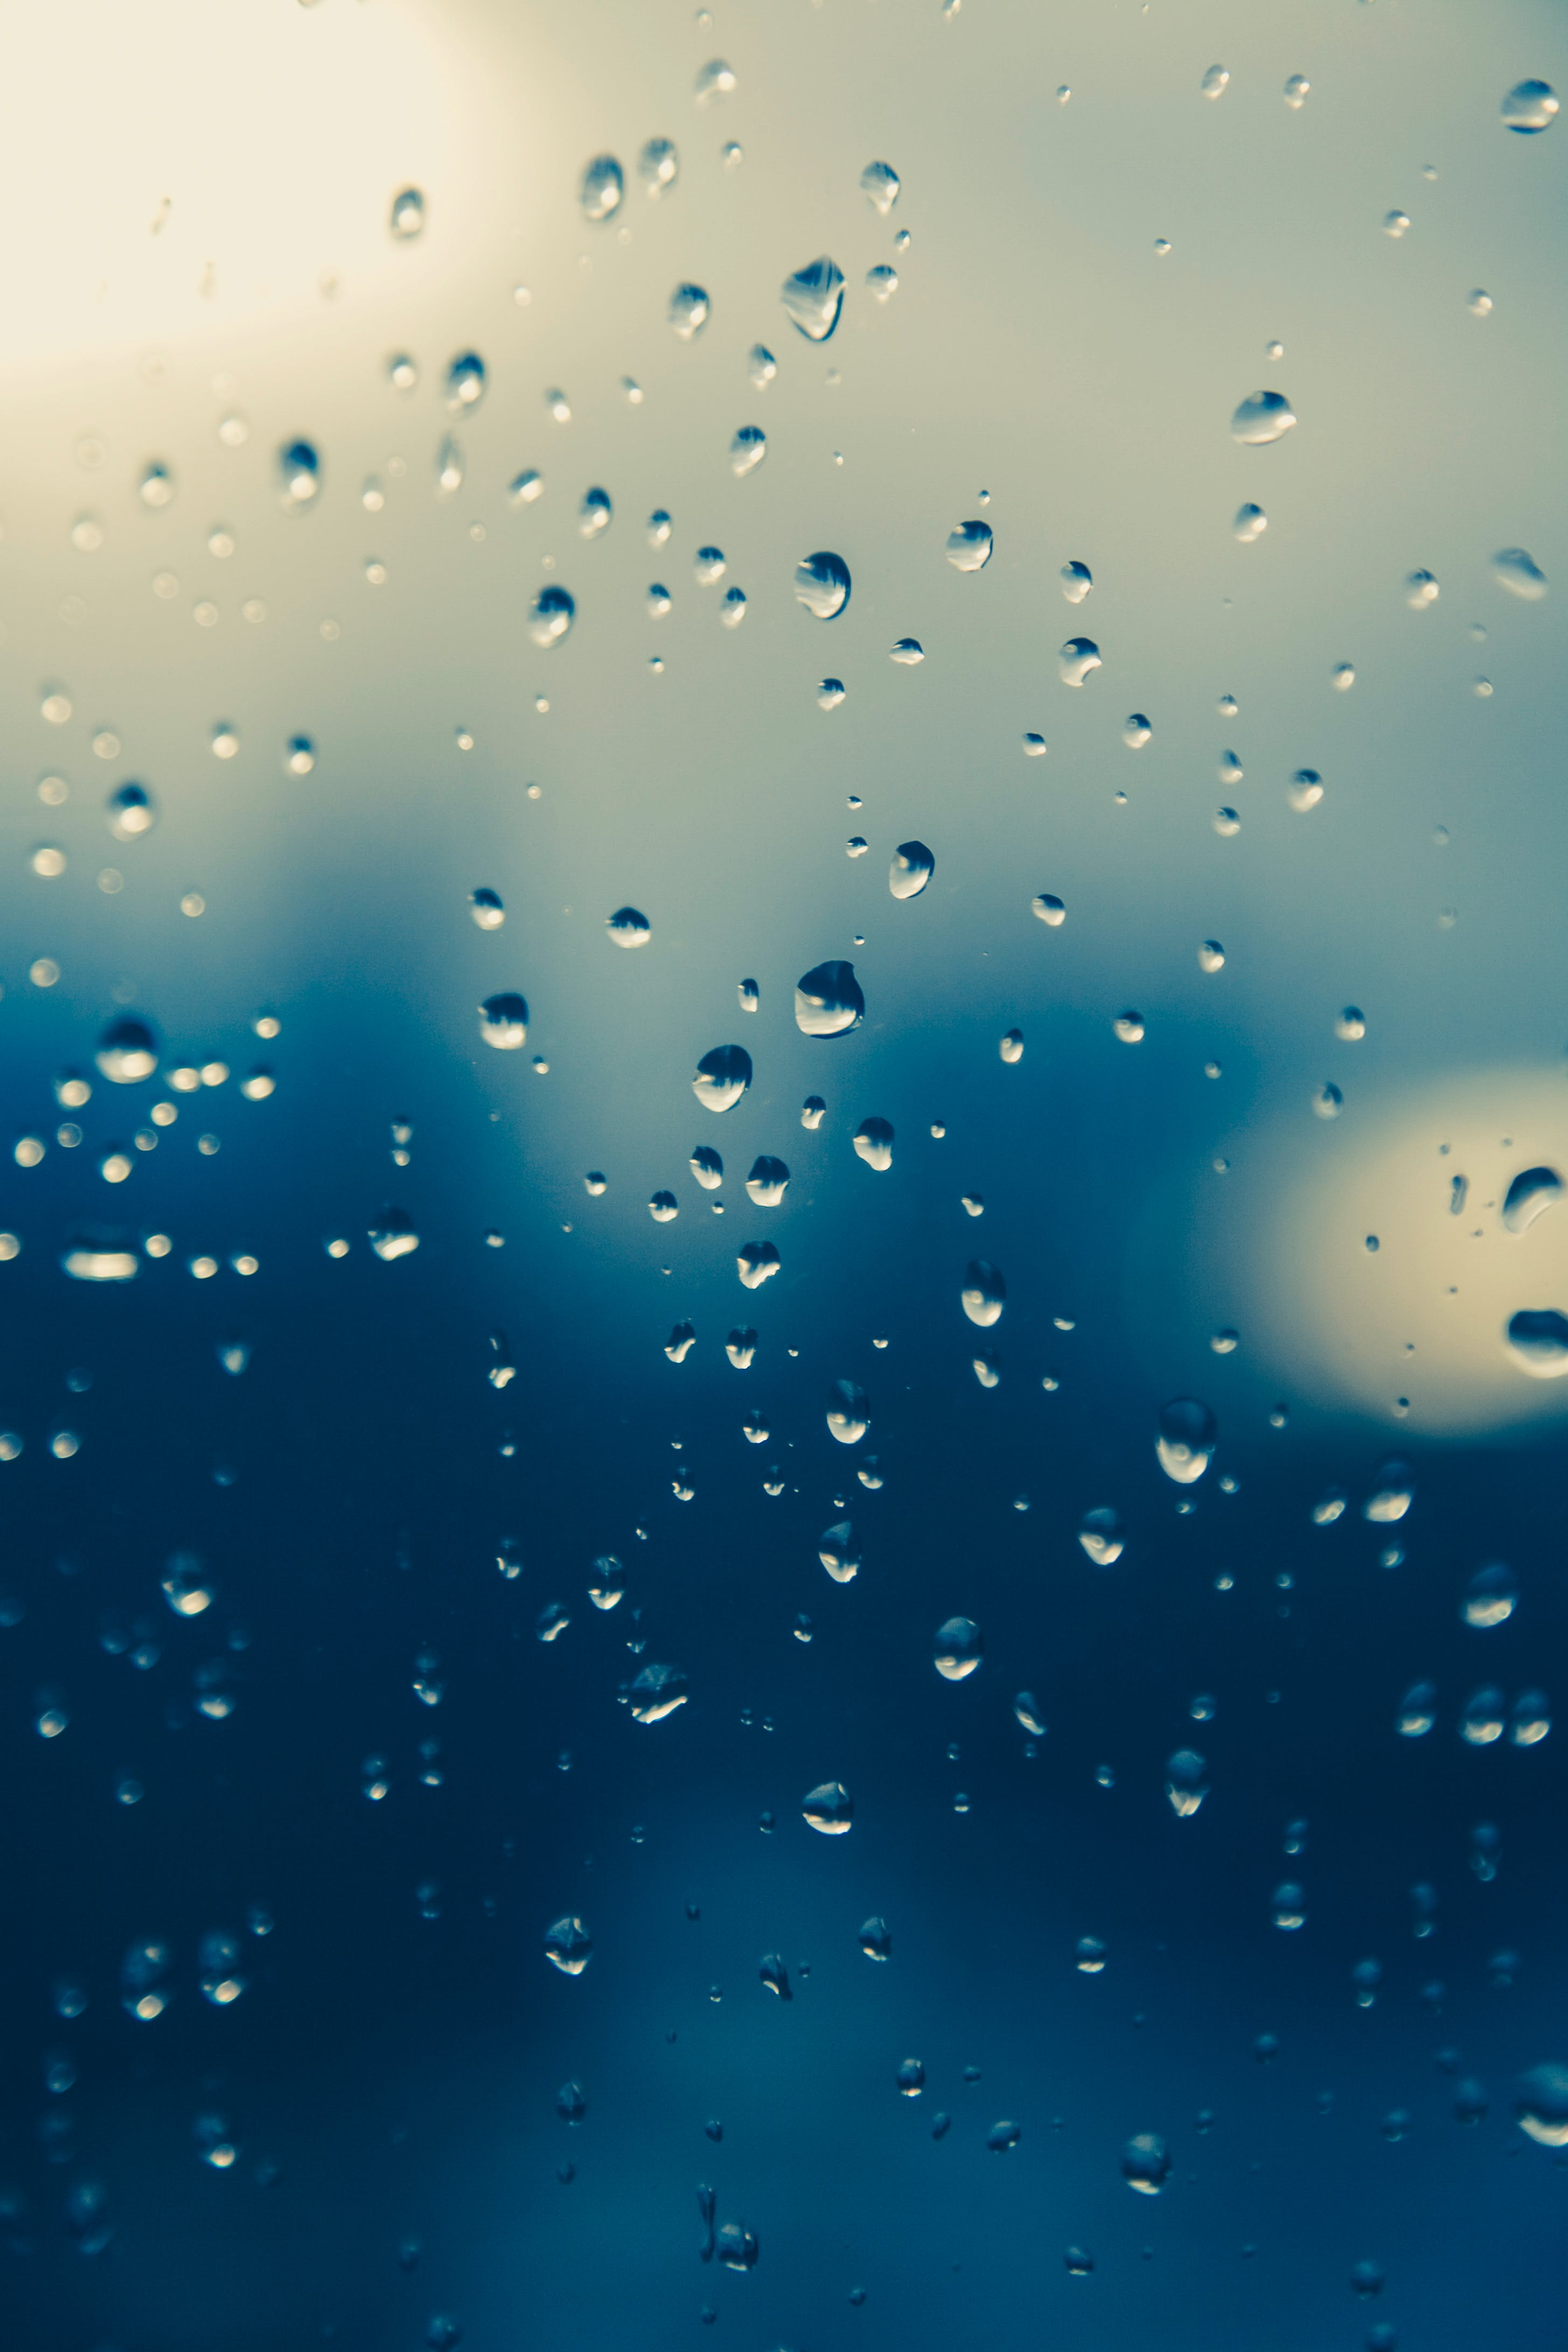 Kostenloses Stock Foto zu nass, regen, regentropfen